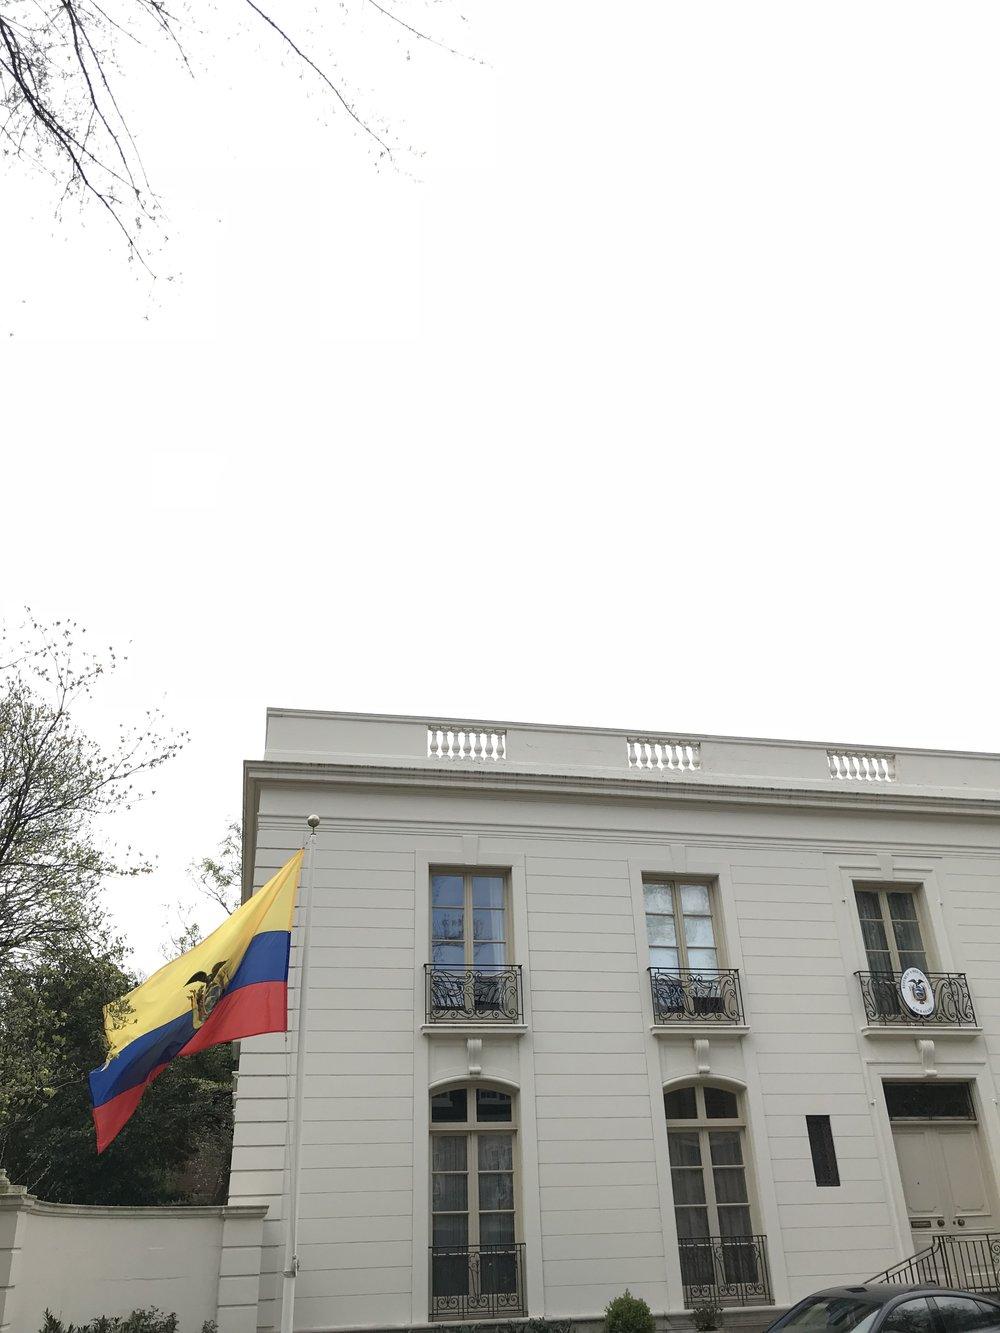 Residence of the Ecuadorian Ambassador.